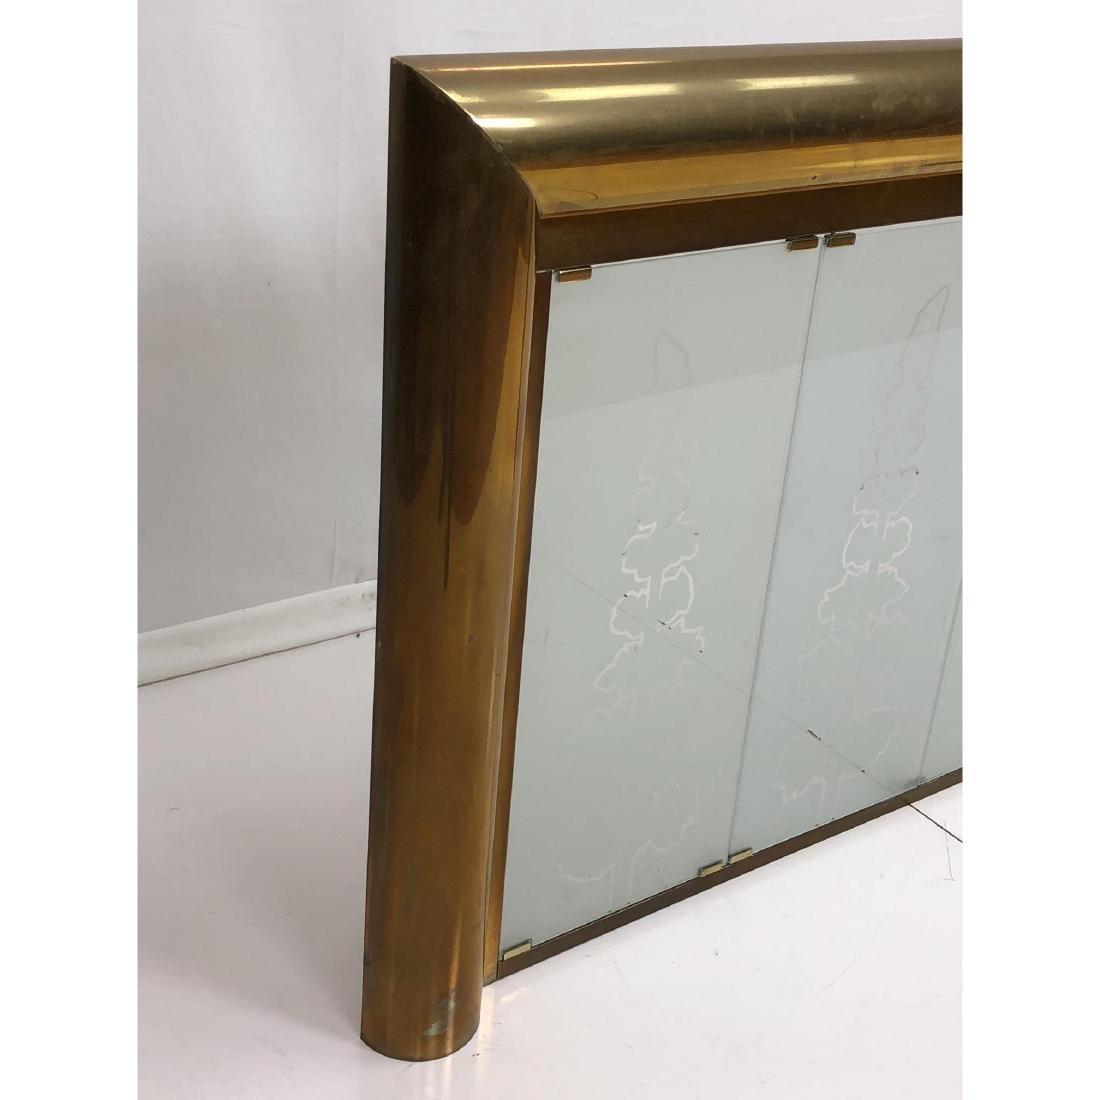 Modernist Brass Frame Oversized Fireplace Surroun - 3